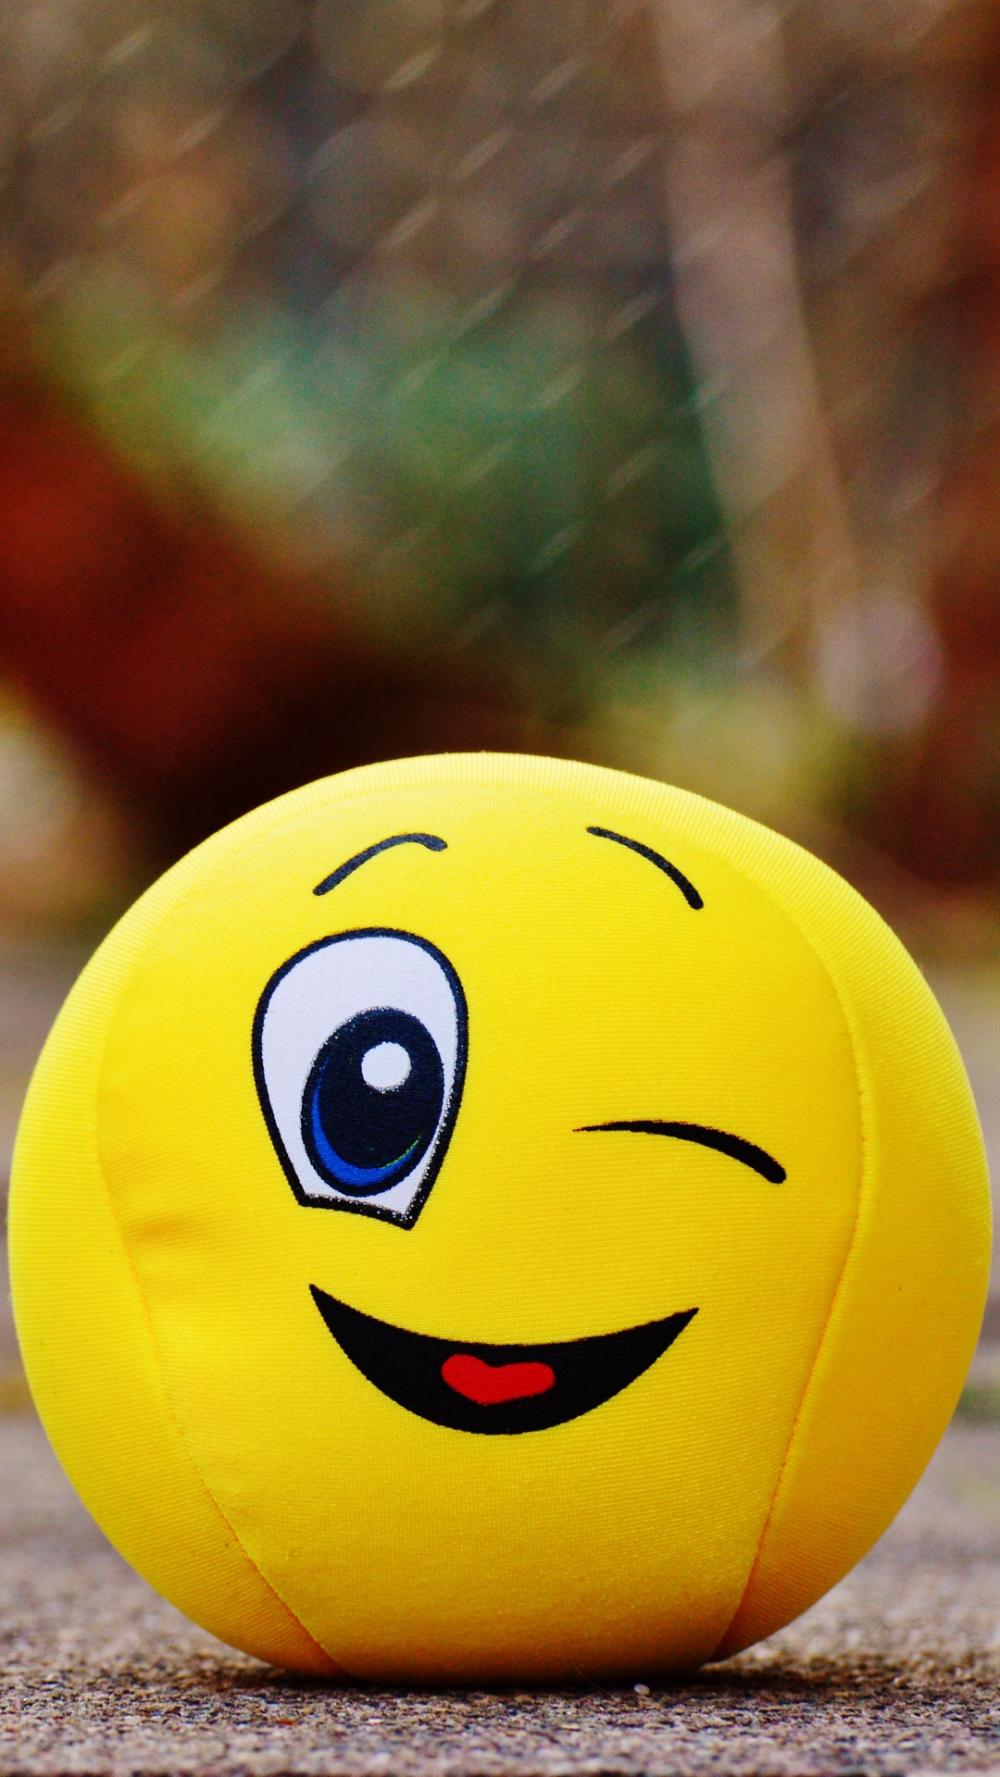 Ball Smile Happy Toy Whatsapp Profile Picture Smile Wallpaper Emoji Wallpaper